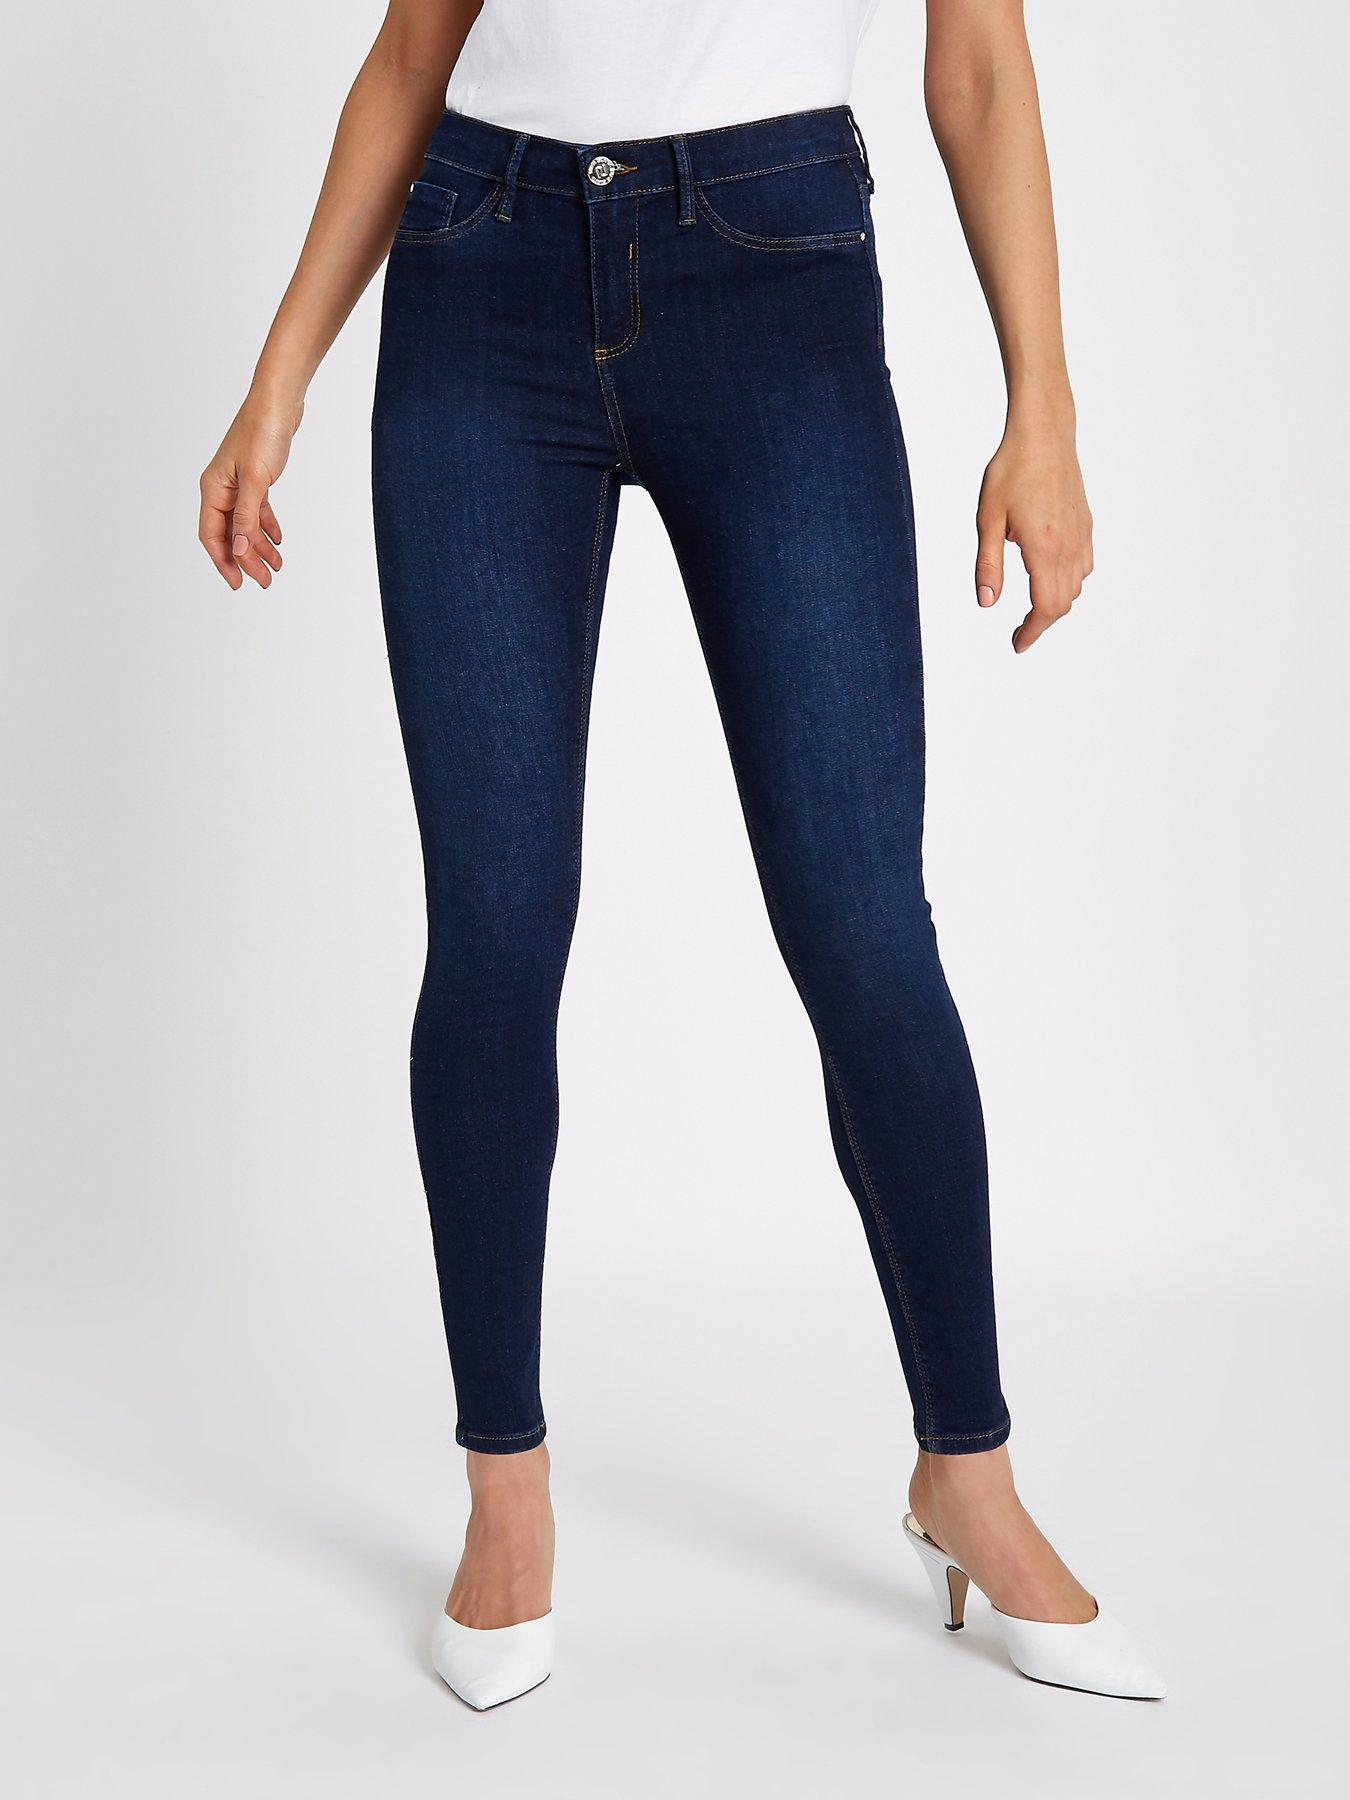 River Island River Island Regular Leg Molly Skinny Jeans- Mid Auth